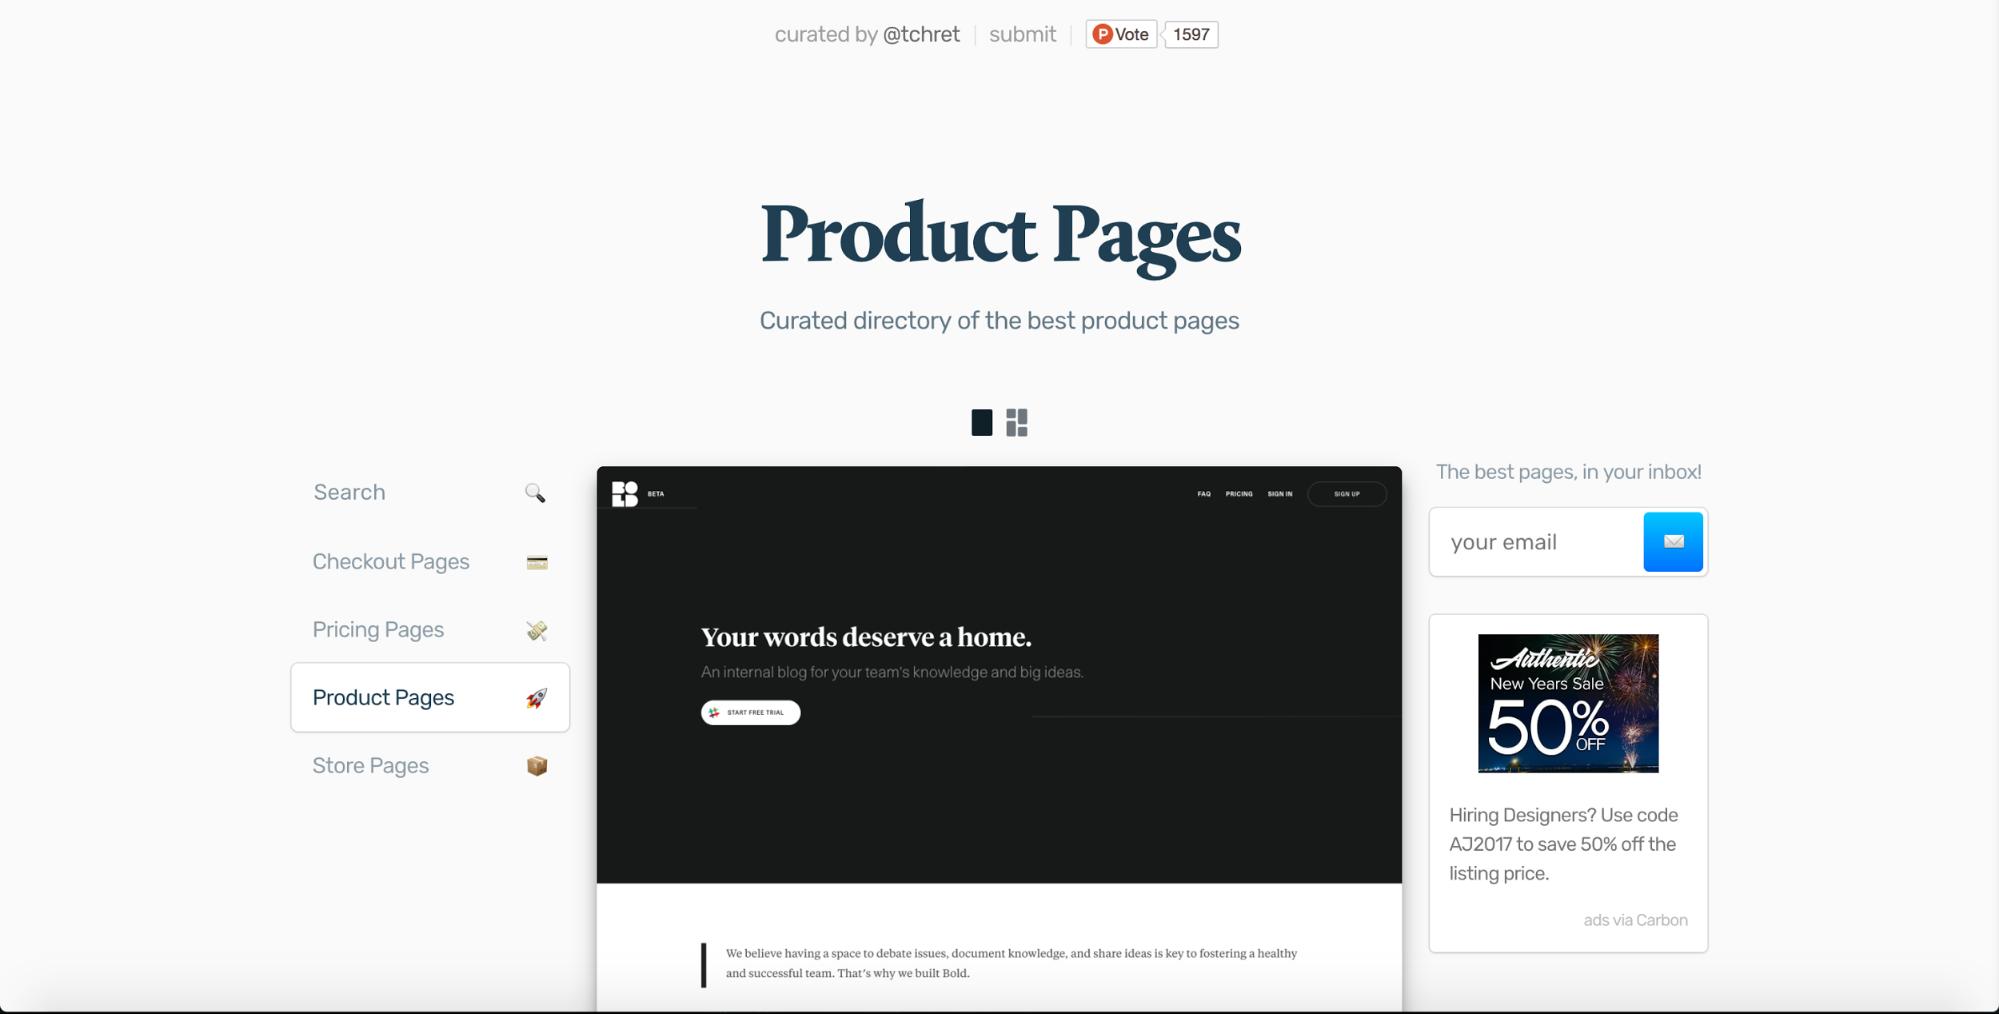 22 web design inspiration resources you\'ll love | Webflow Blog